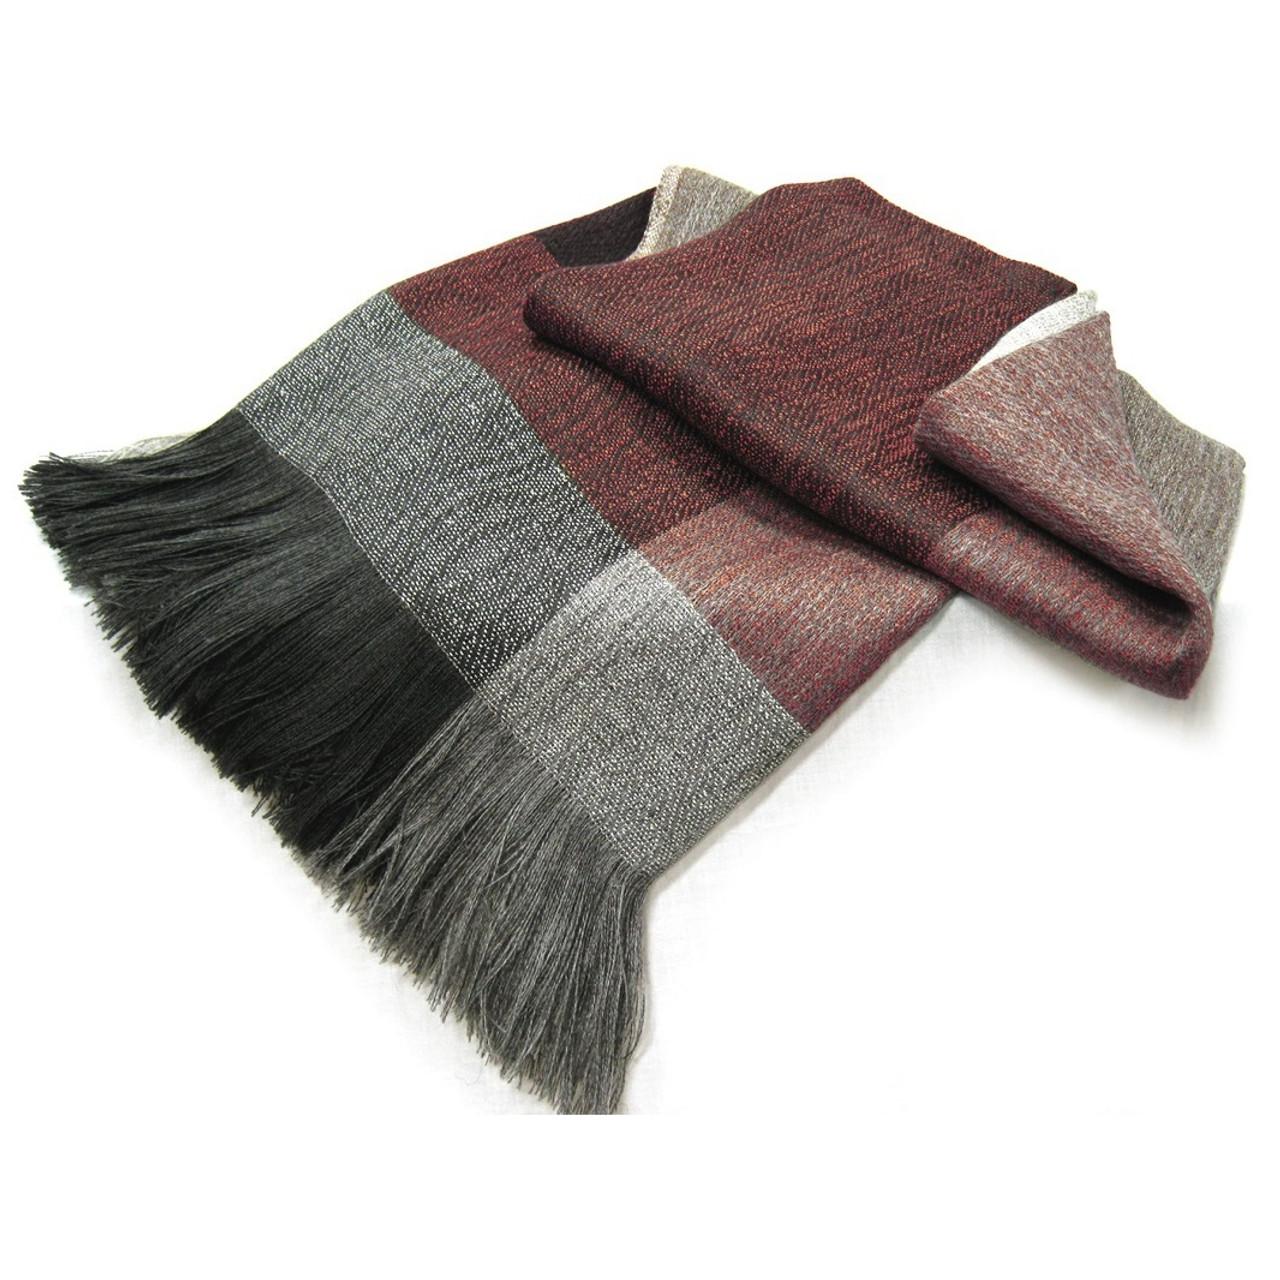 5398b74c1c8d9 Stansborough Wool & Alpaca Woven Throw - The Tin Shed